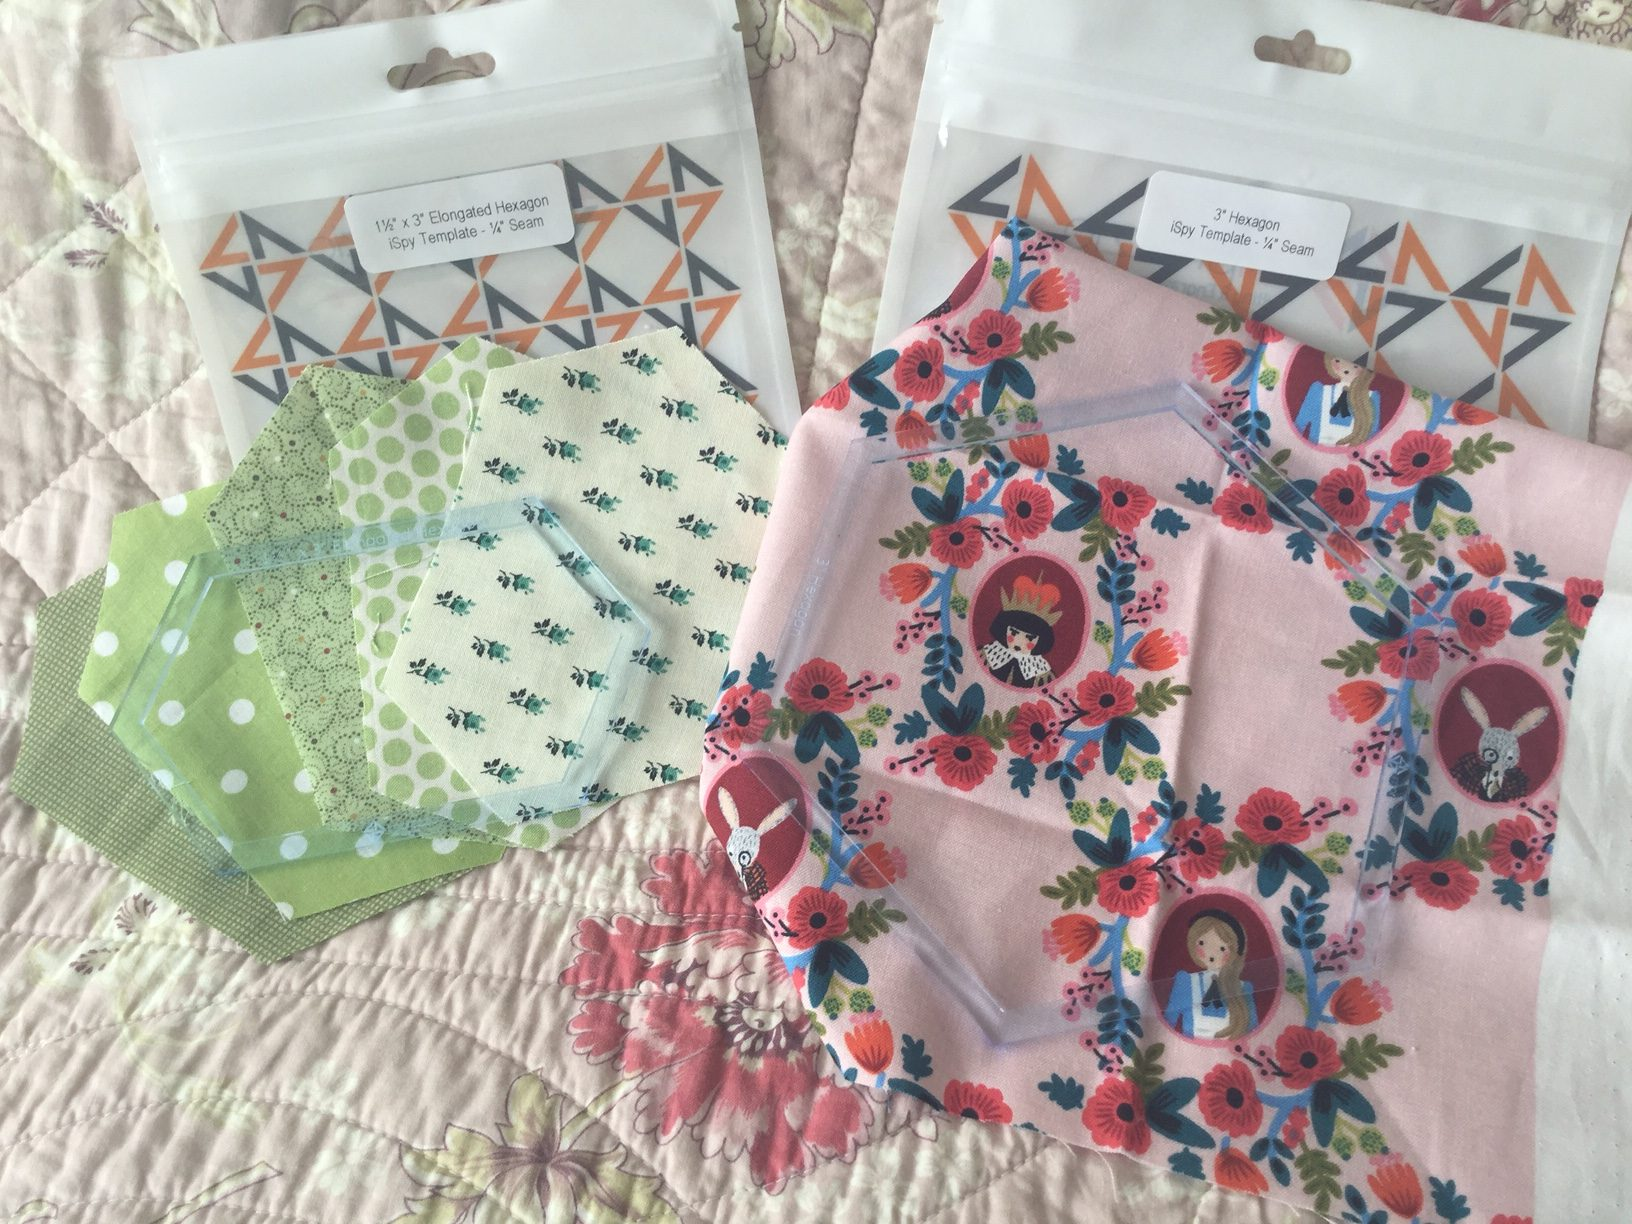 Hexagon Ispy Quilt Plastic Template Set Brigitte